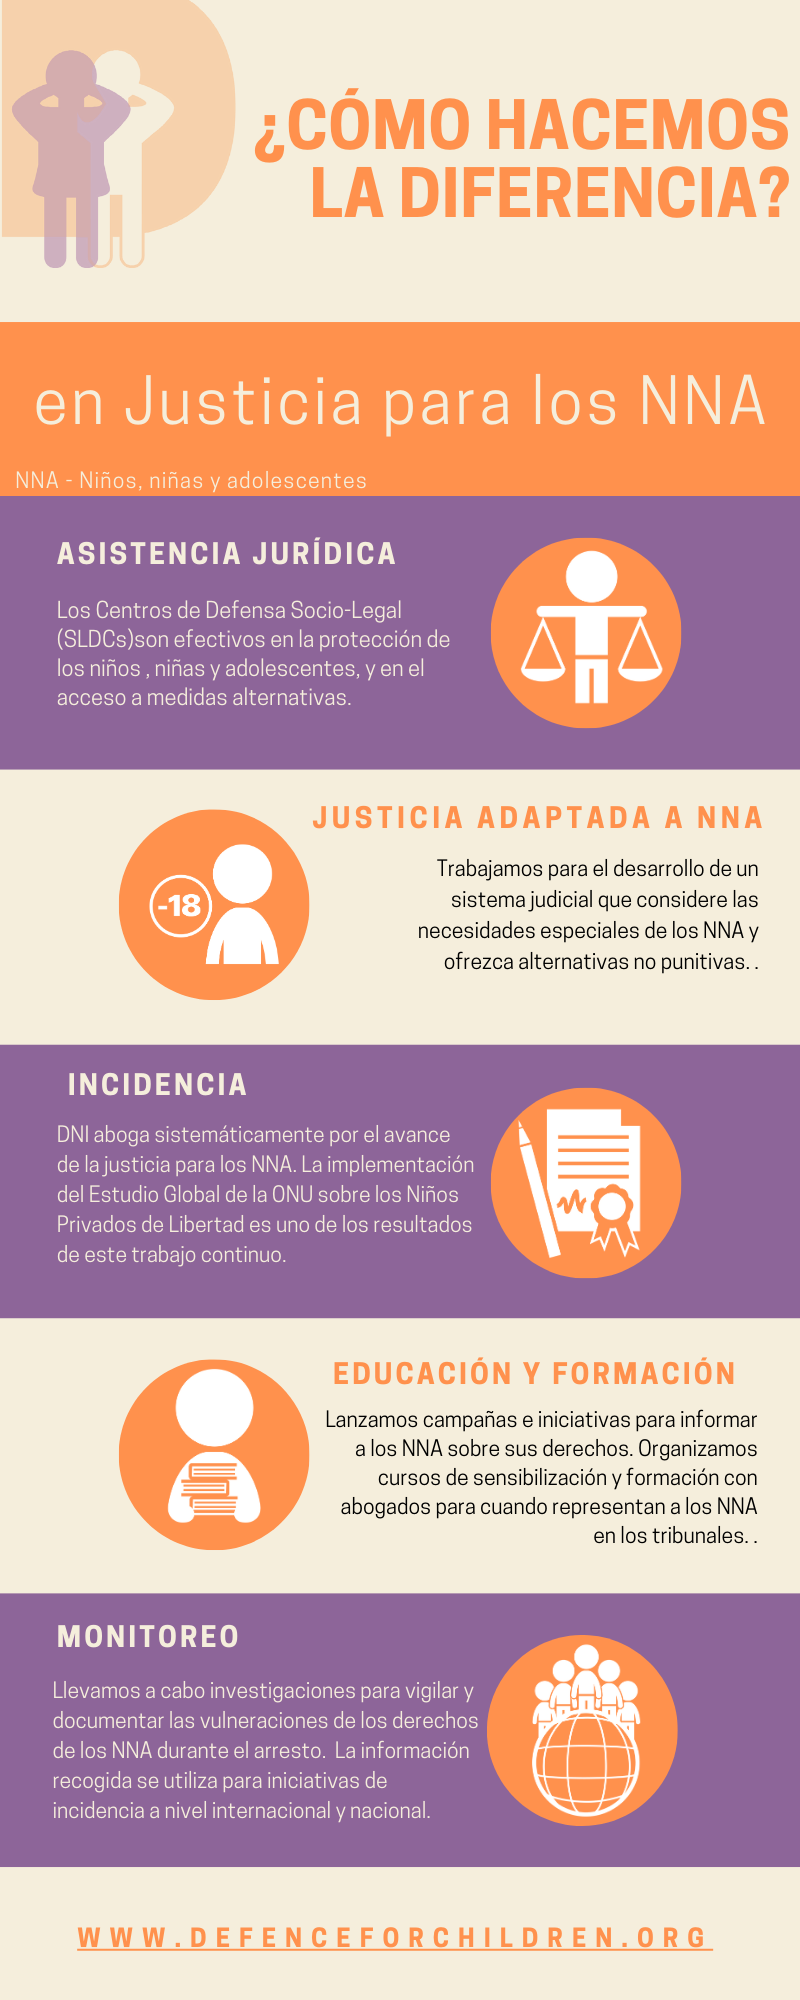 ES Justice for Children